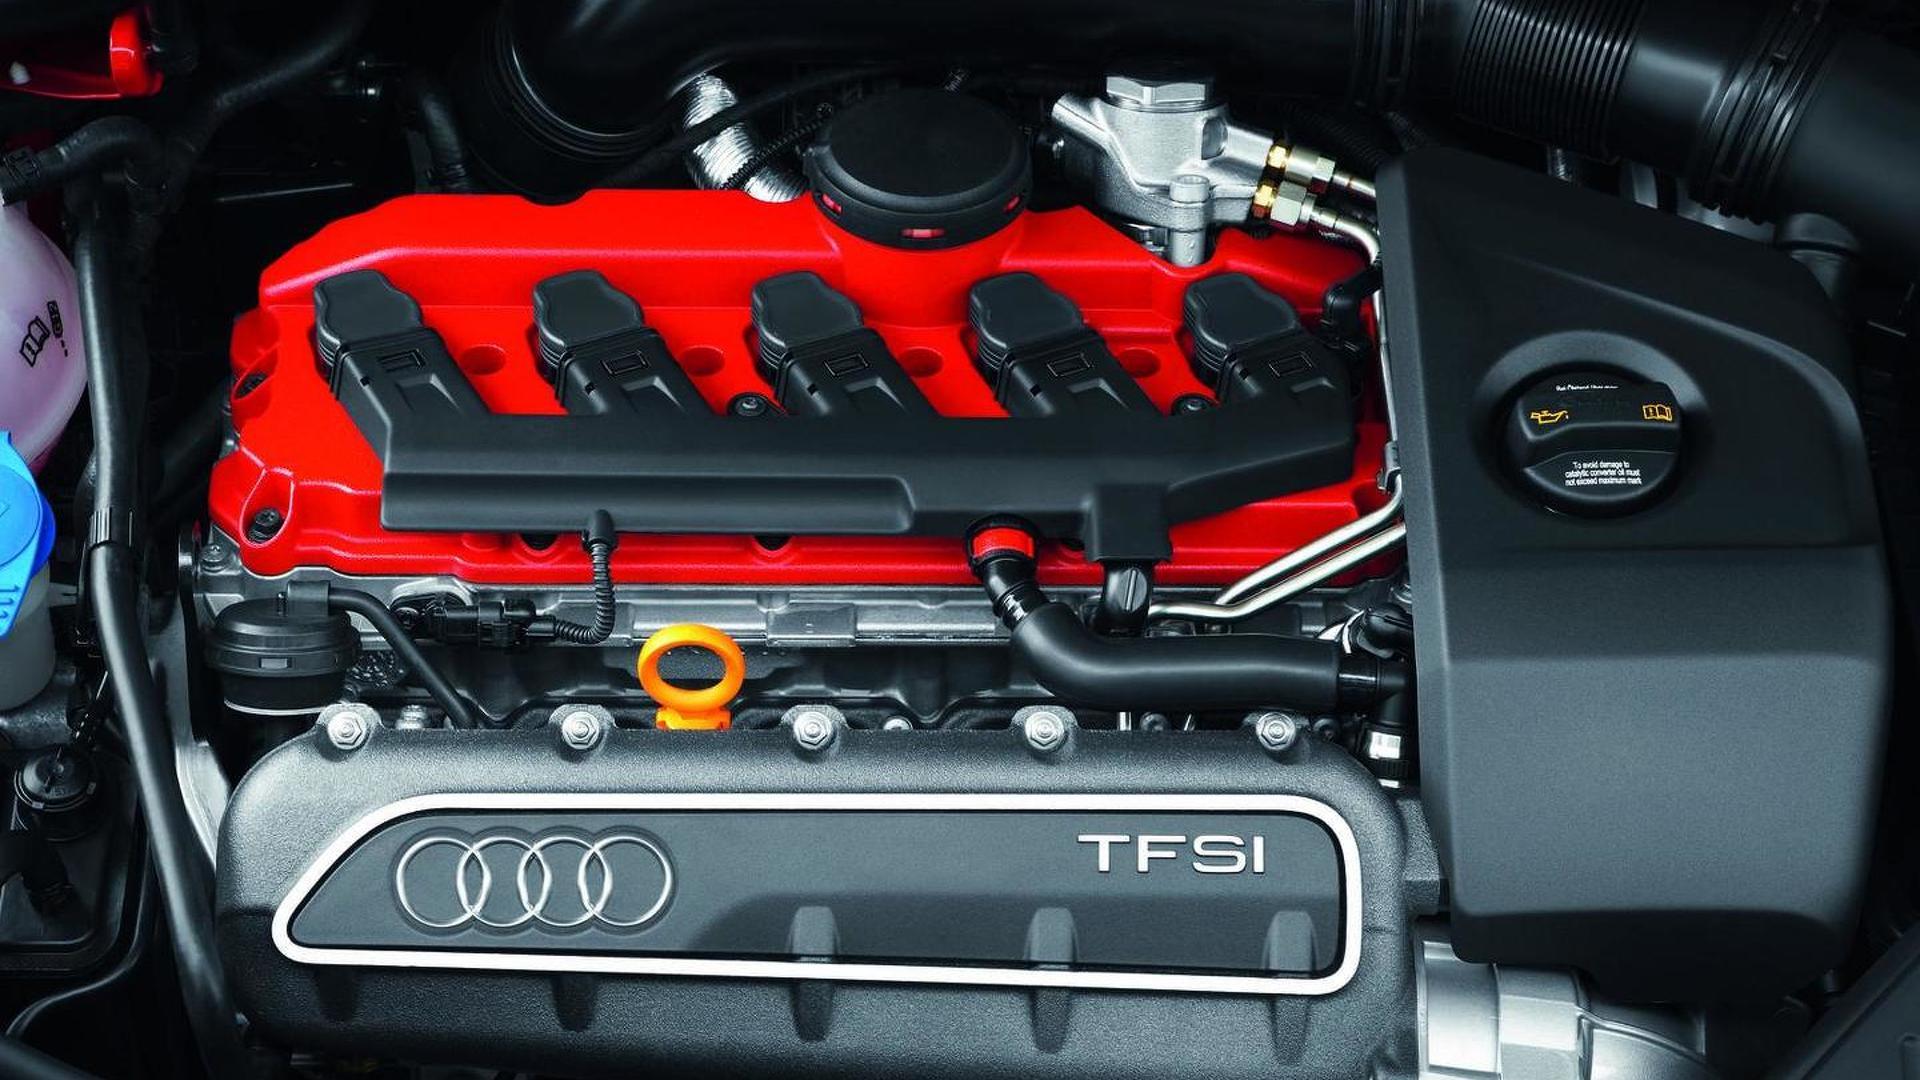 Kelebihan Audi Rs3 2012 Tangguh